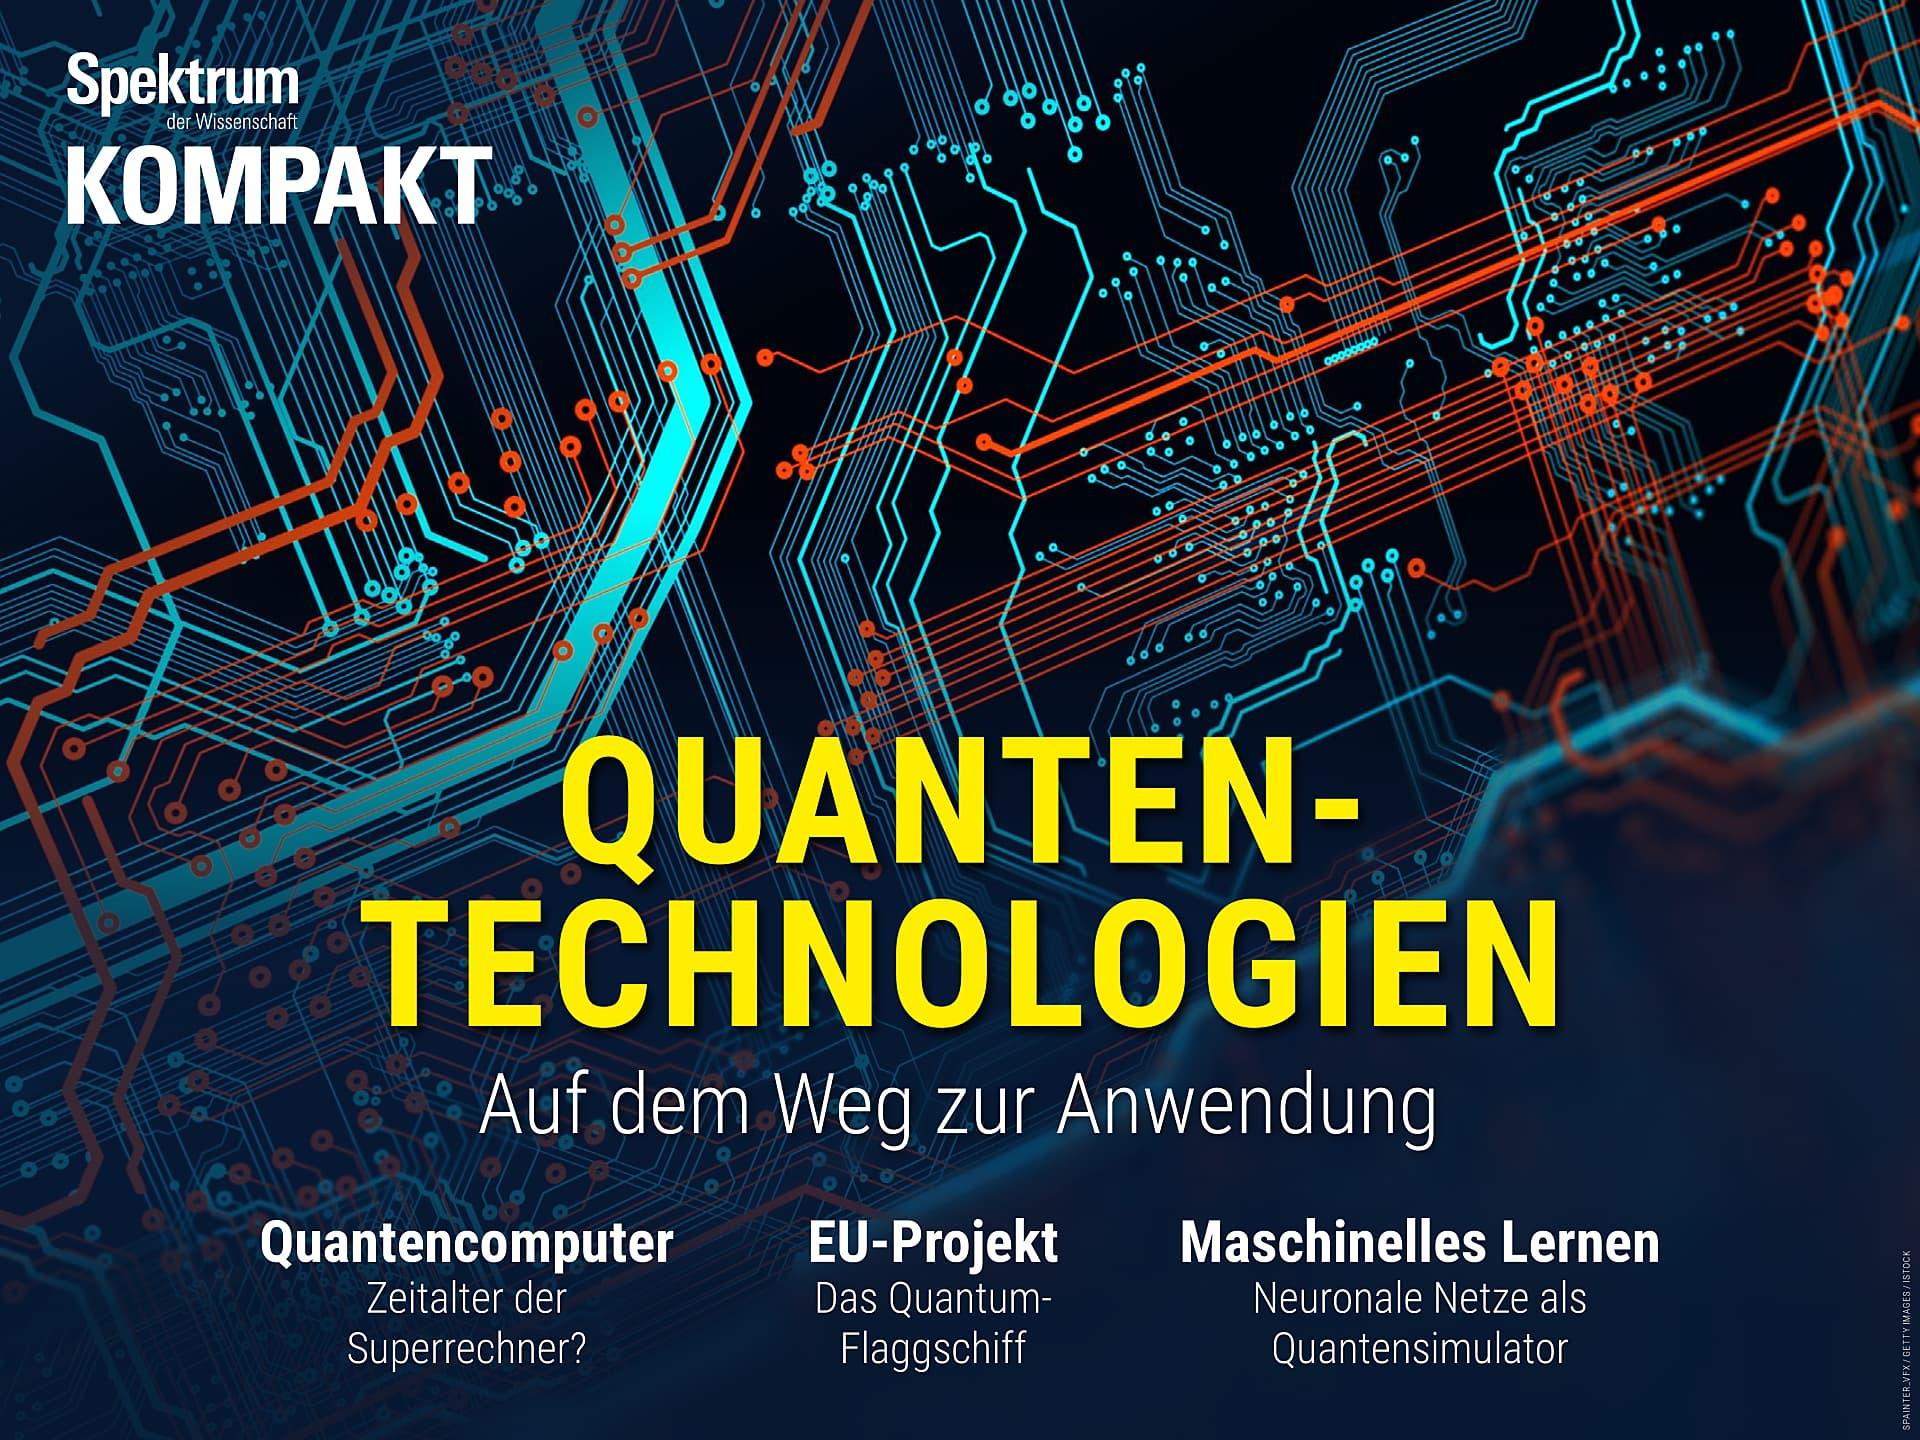 Quantentechnologien - Auf dem Weg zur Anwendung